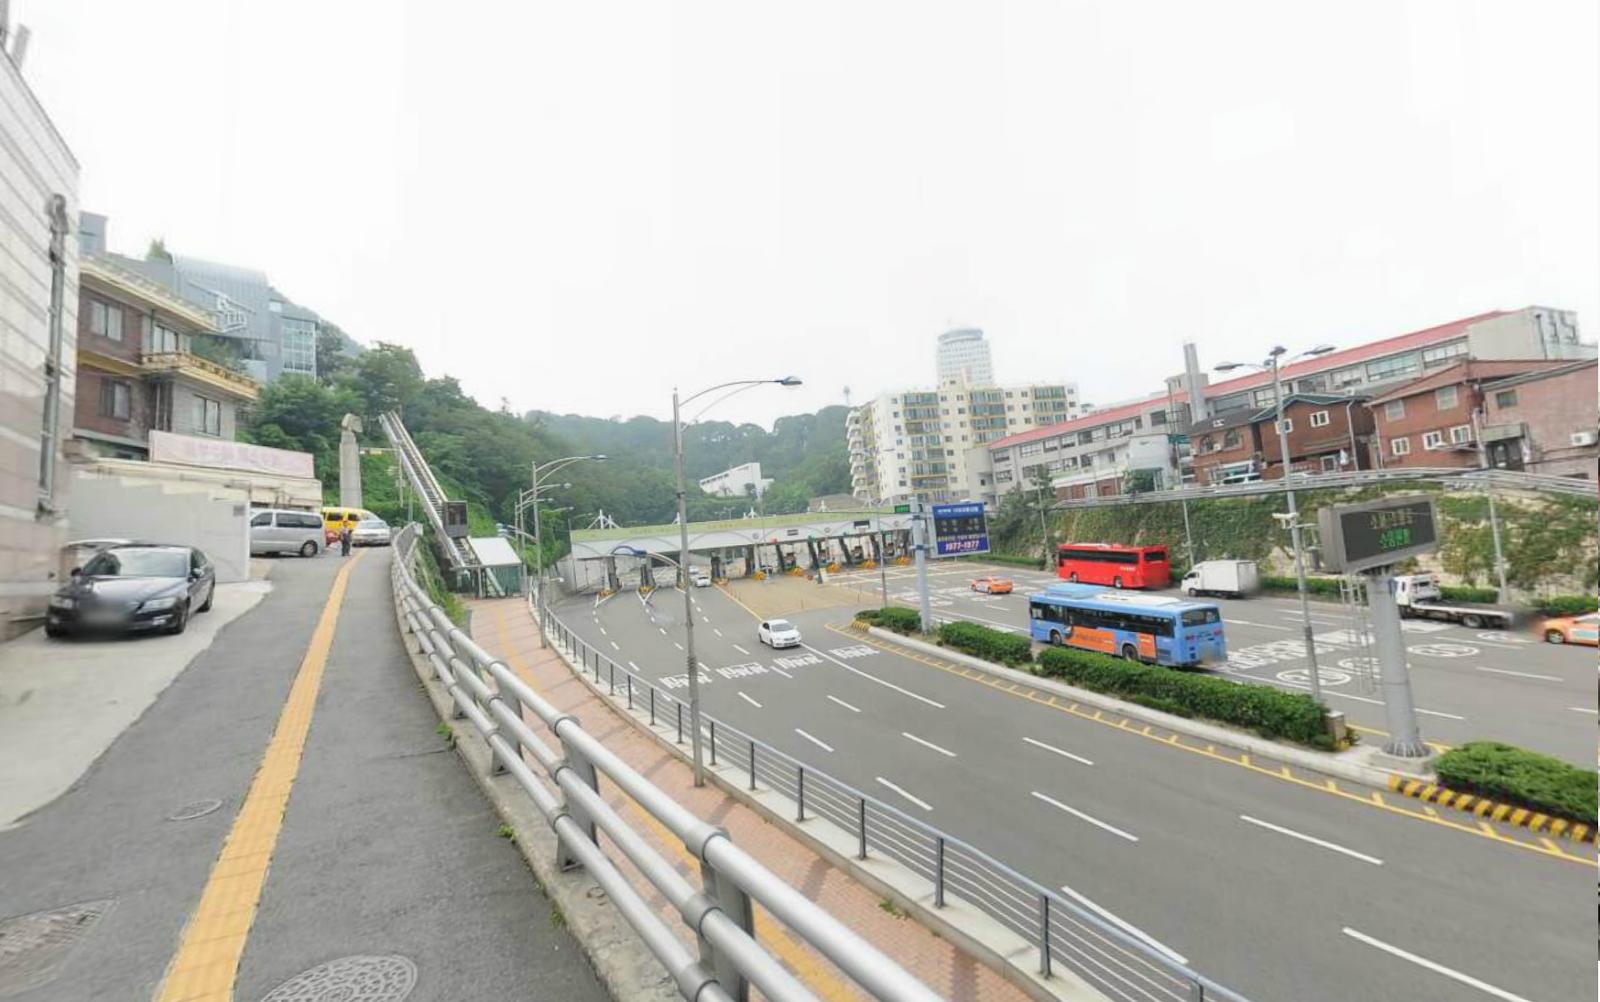 Namsan cable car - Namsan Oreumi Elevator To Go To Namsan Cable Car Station